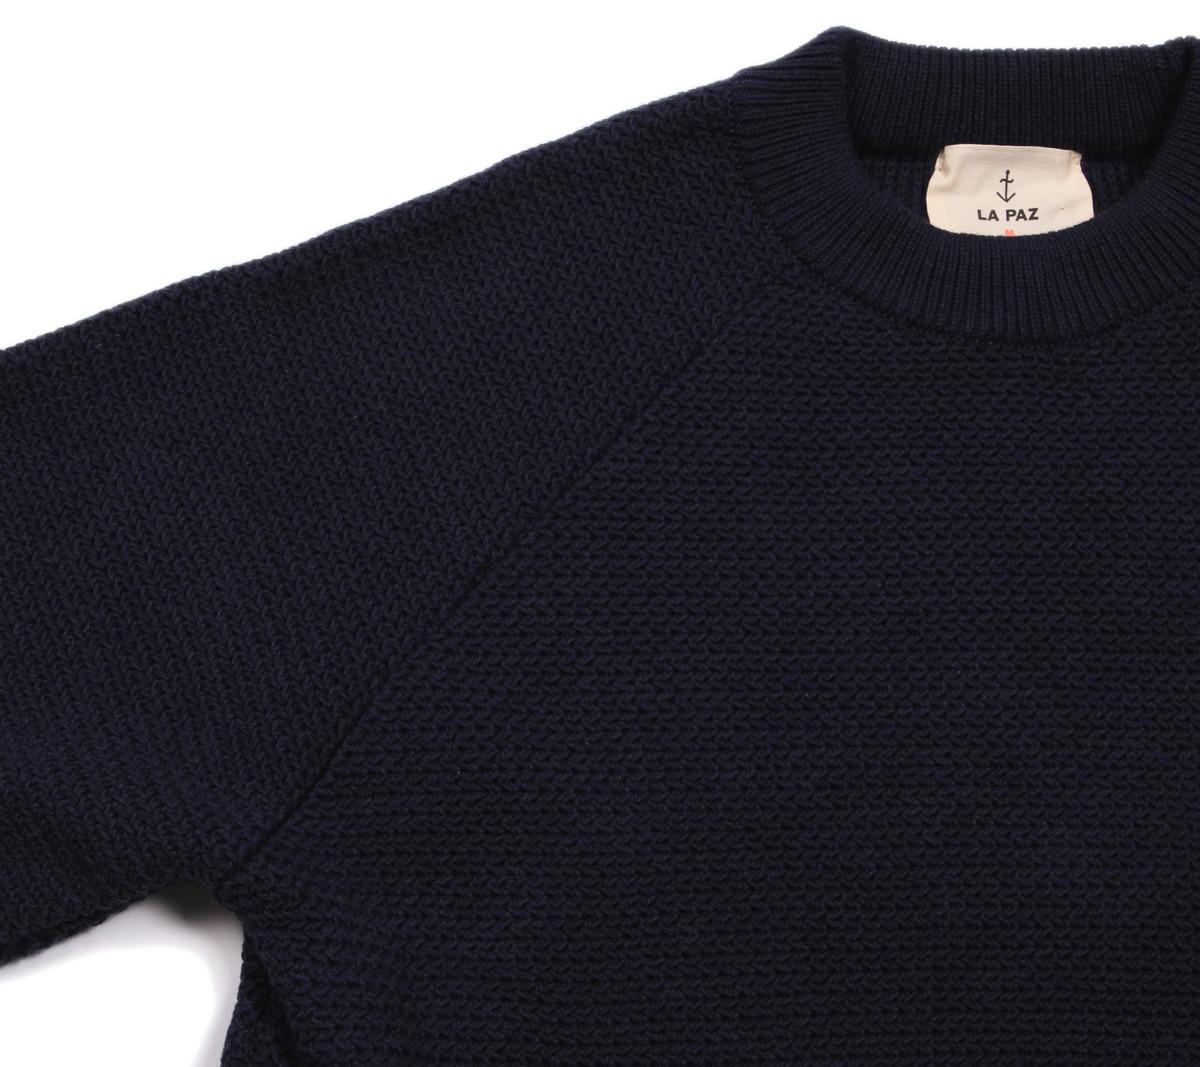 La Paz Rato Cotton Summer Sweater | Navy | Garmentory